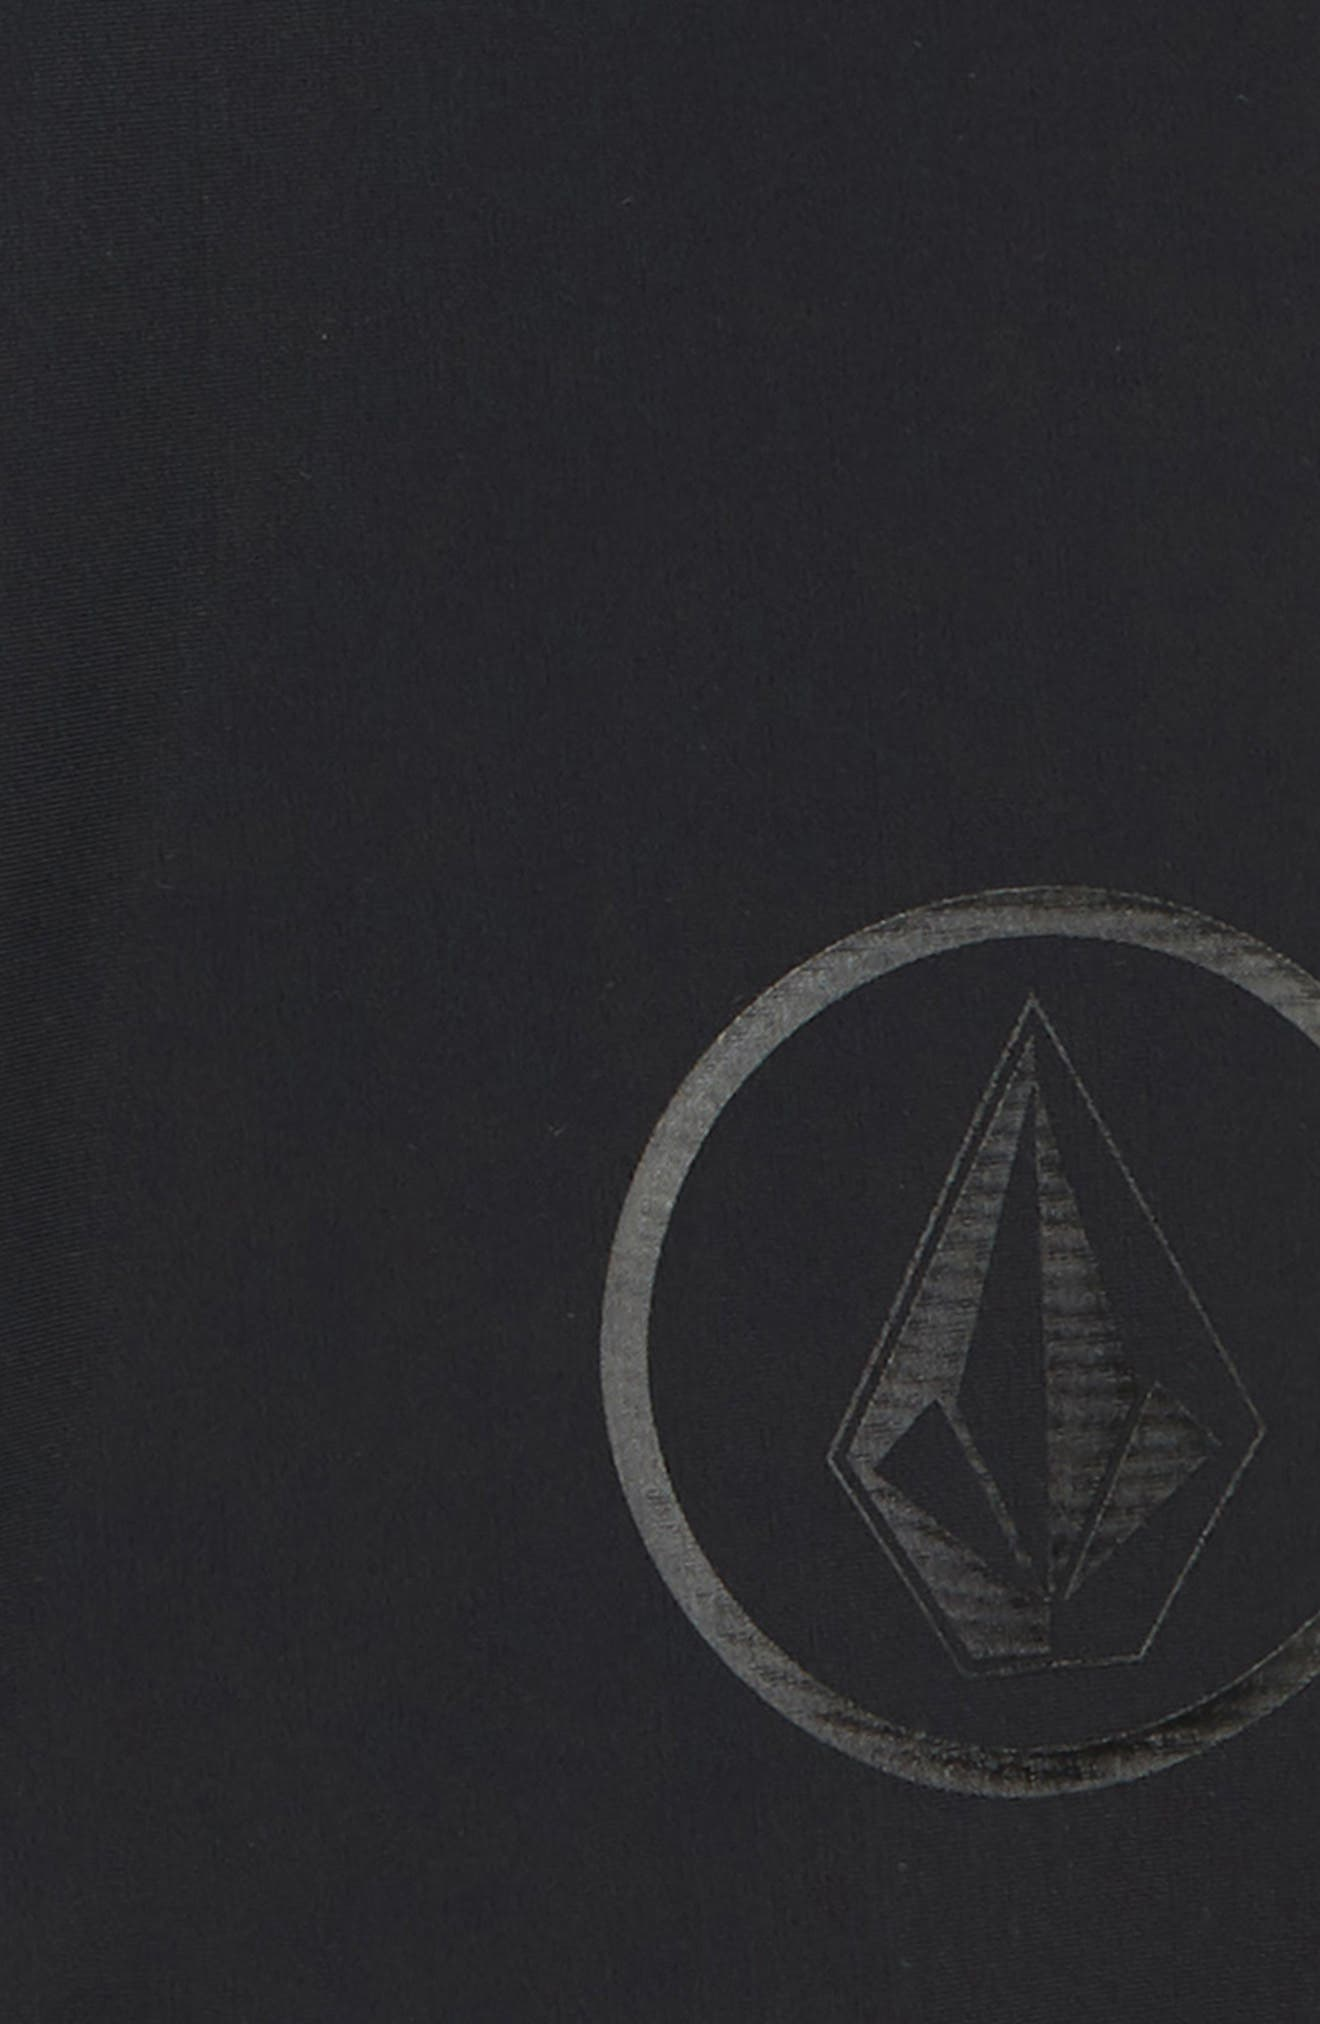 JJ Chones Compression Shorts,                             Alternate thumbnail 2, color,                             Black